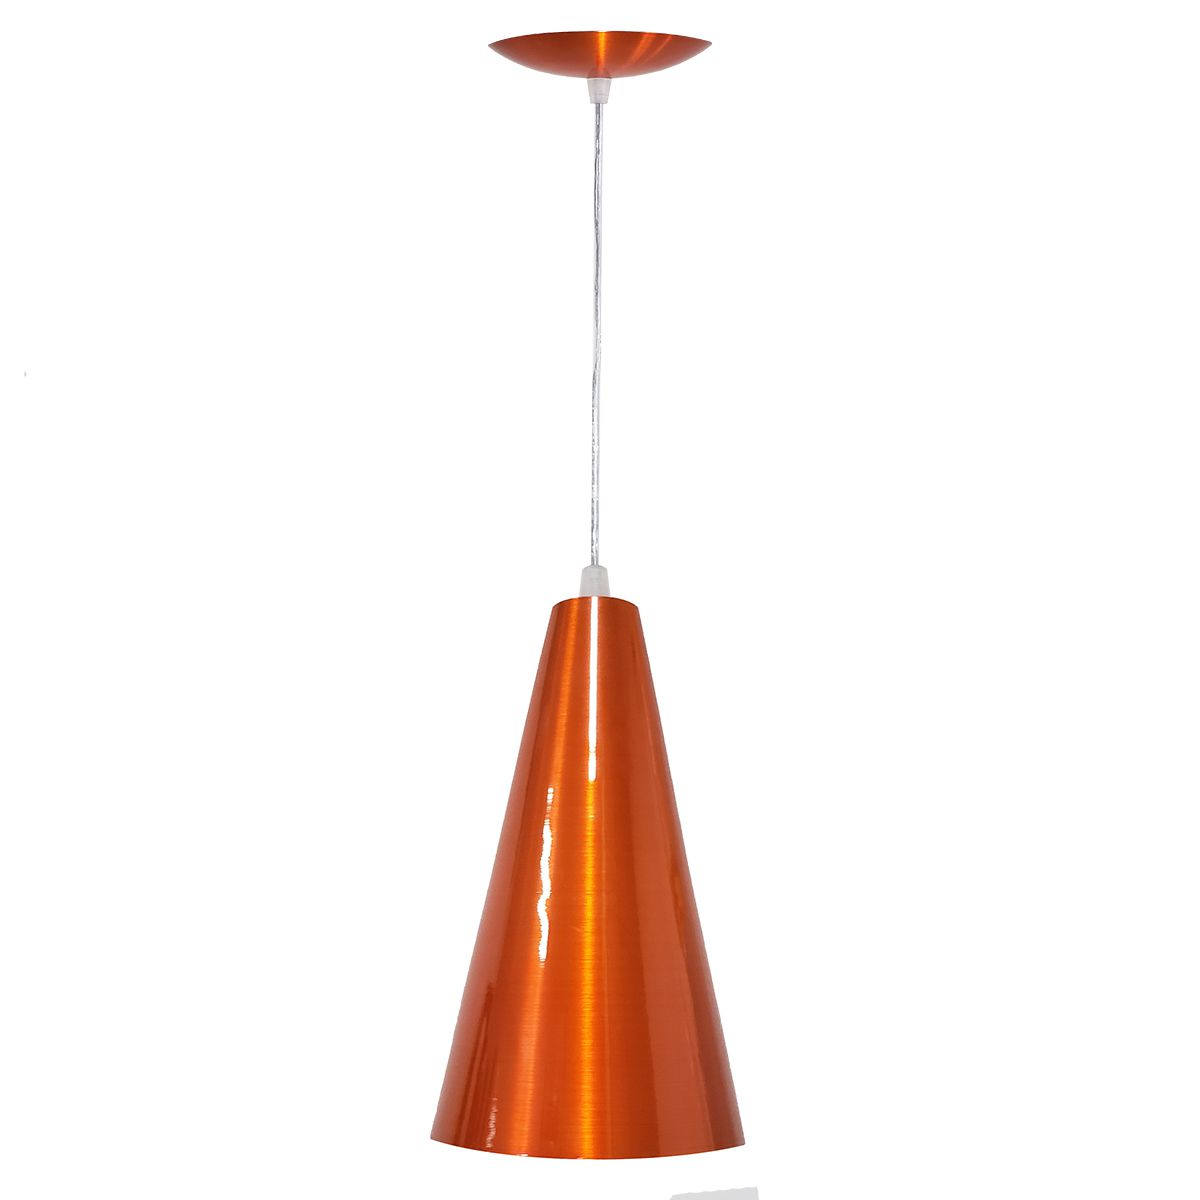 Luminária Decorativa Cônico Mini Laranja Cobreado Pendente